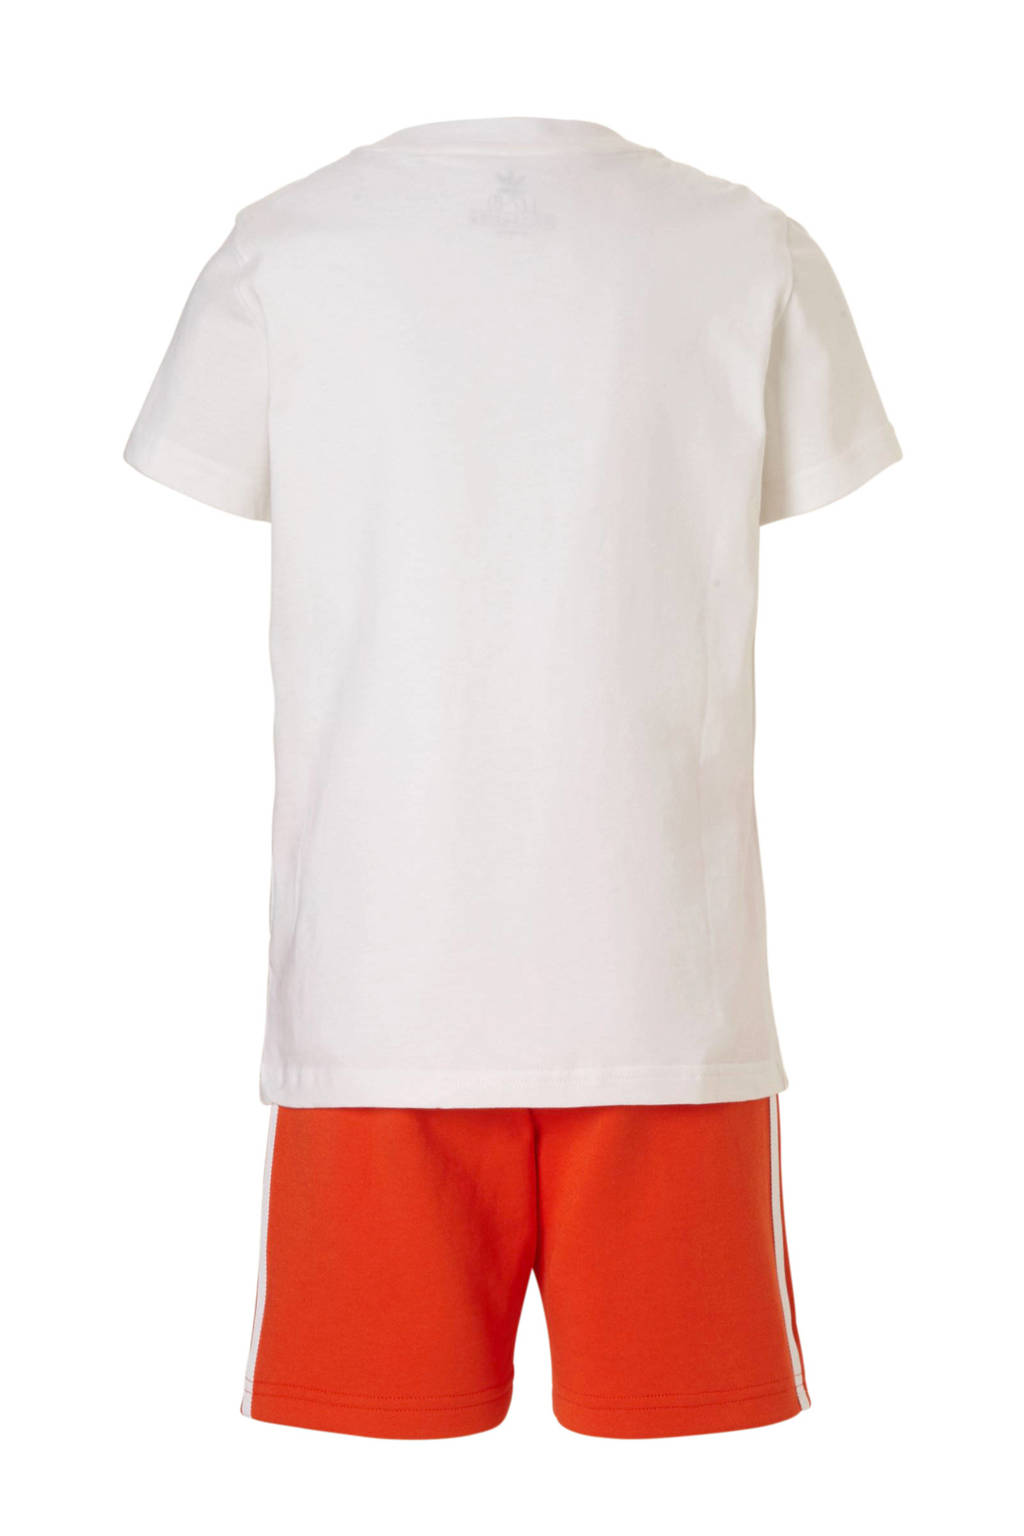 adidas Originals shirt + short rood/wit, Rood/wit